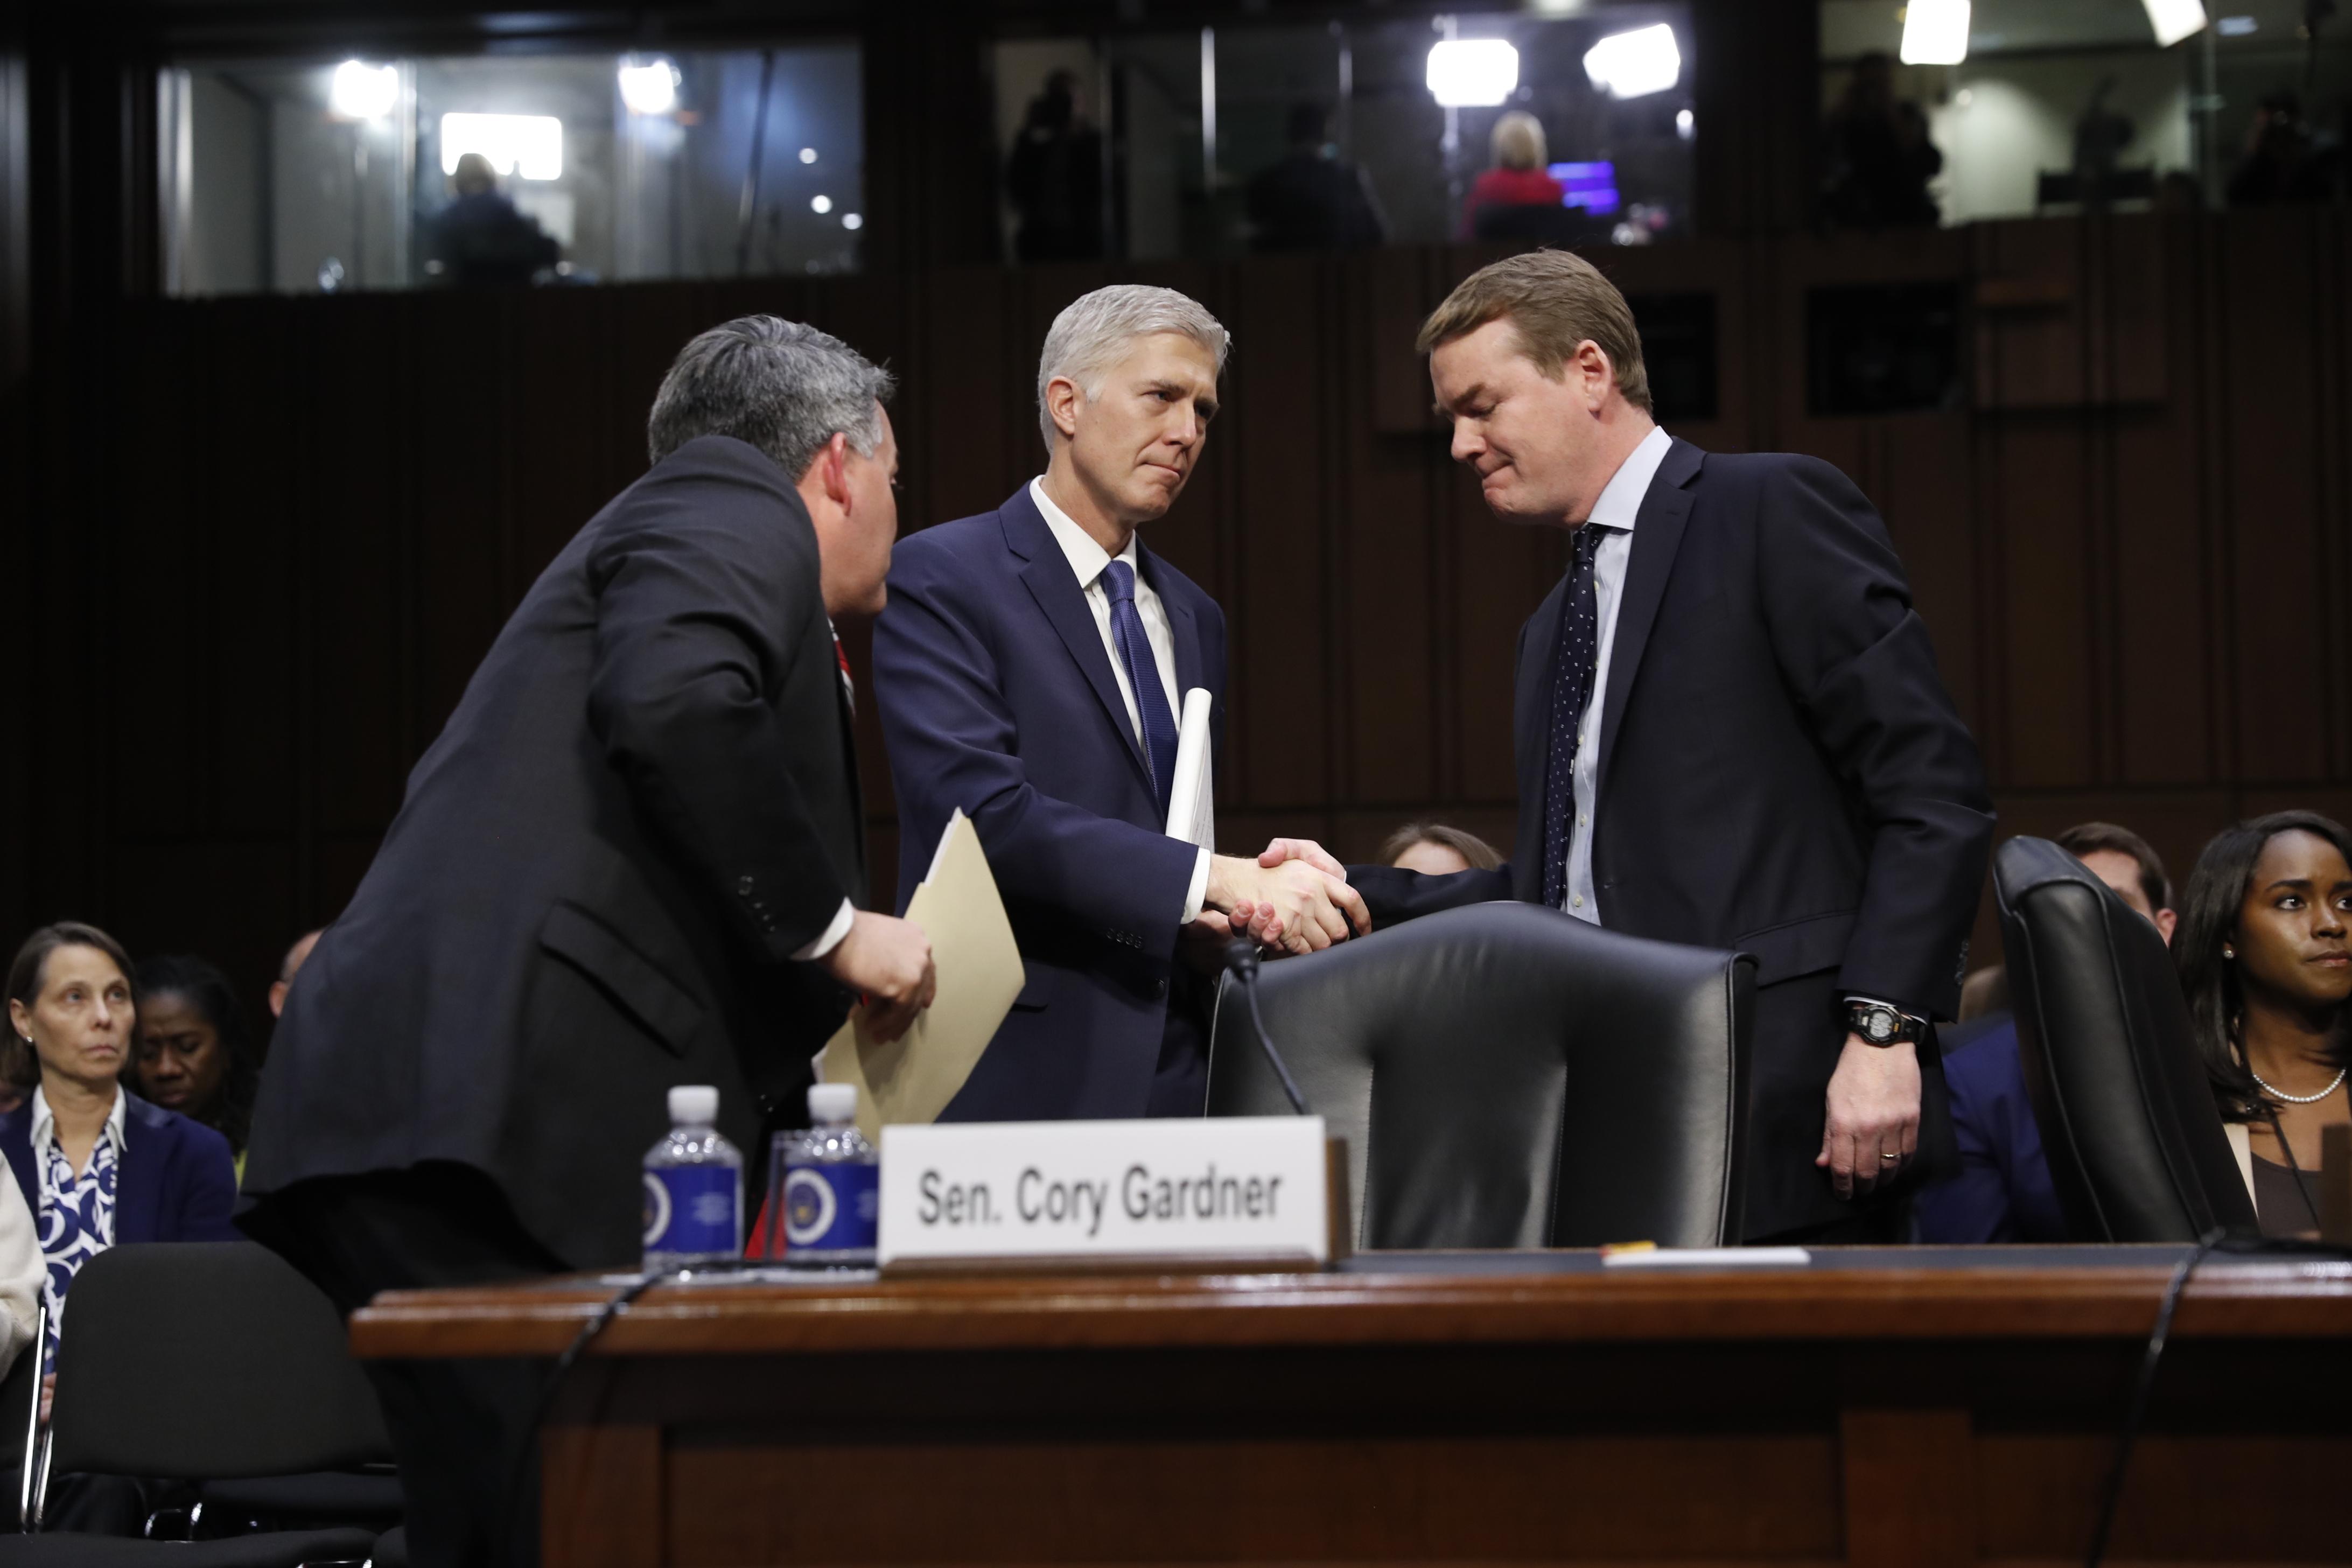 Photo: Gorsuch, Bennet (AP Photo)